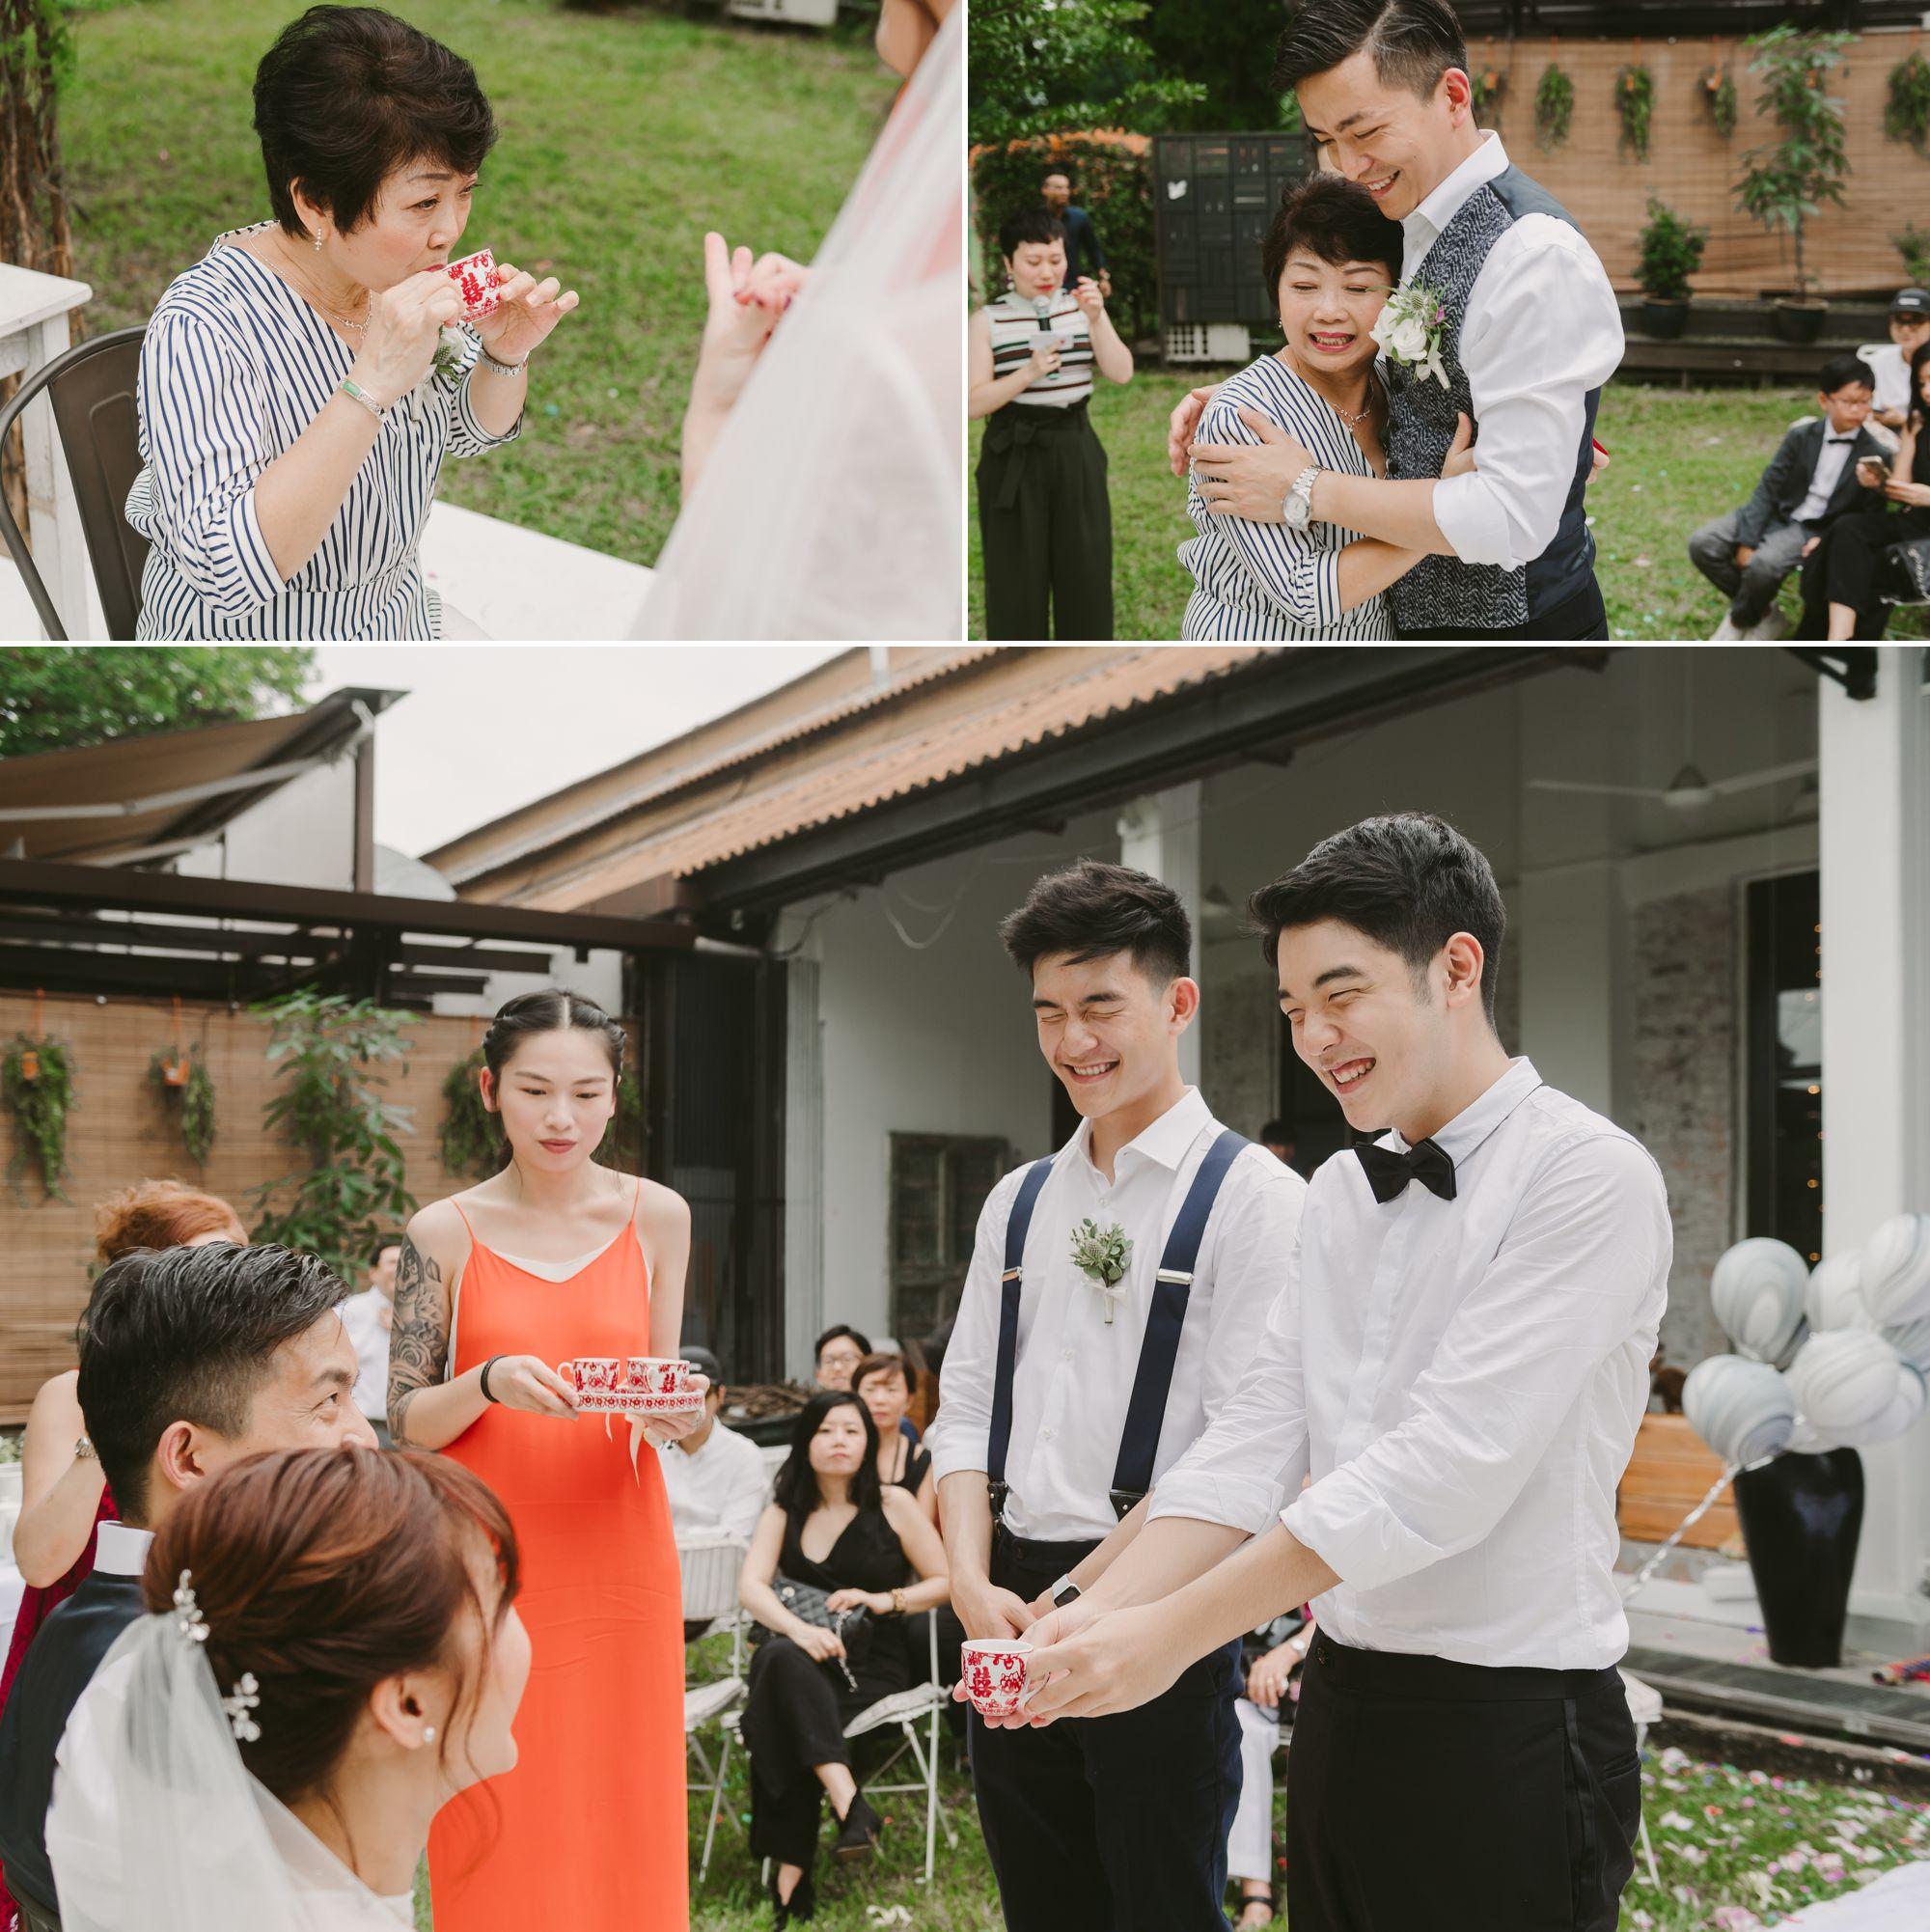 wedding_photography 26.jpg